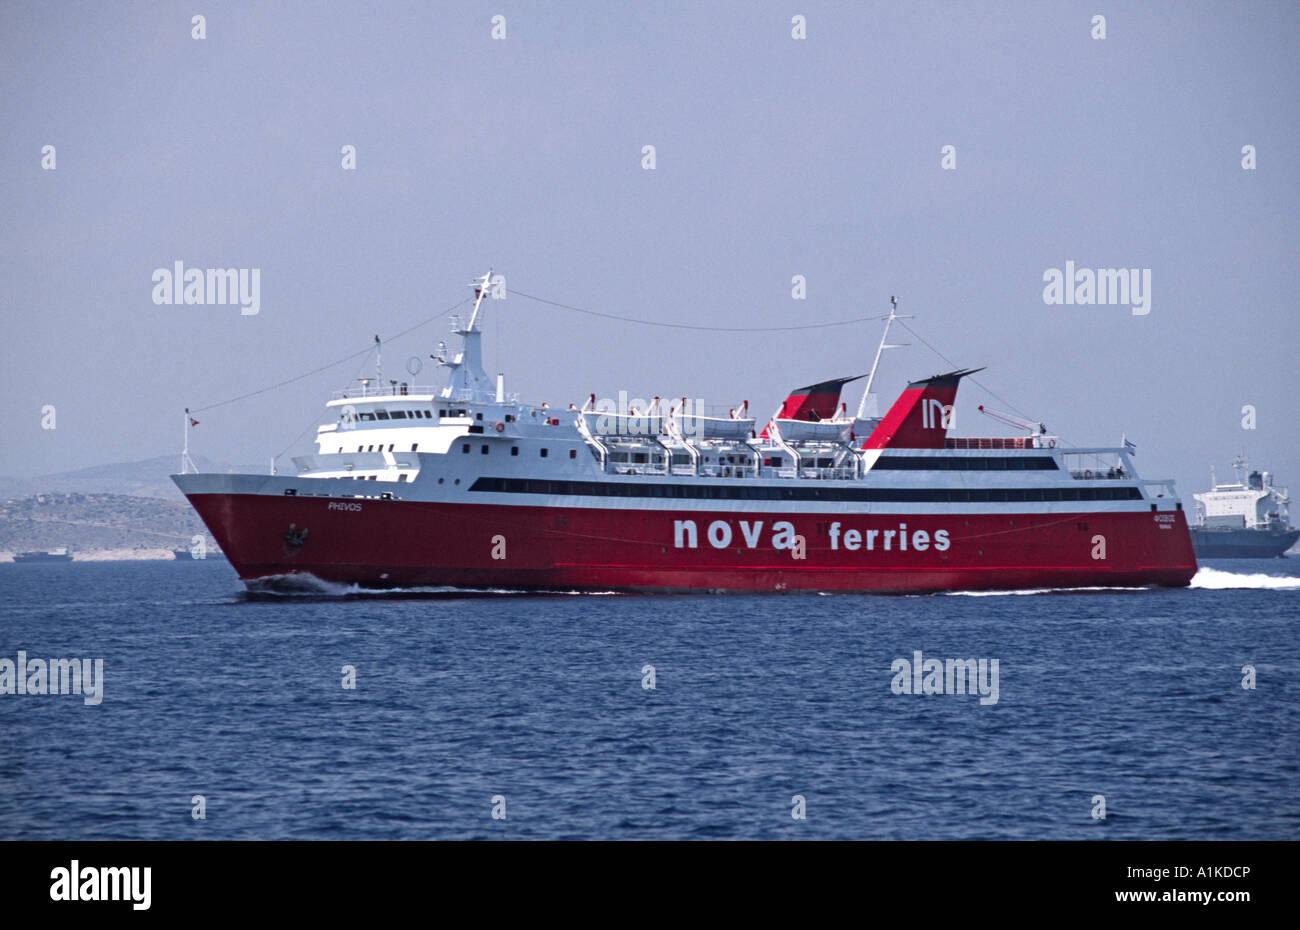 Phivos of Nova Ferries sails between Piraeus and Aegina in Greece. Stock Photo